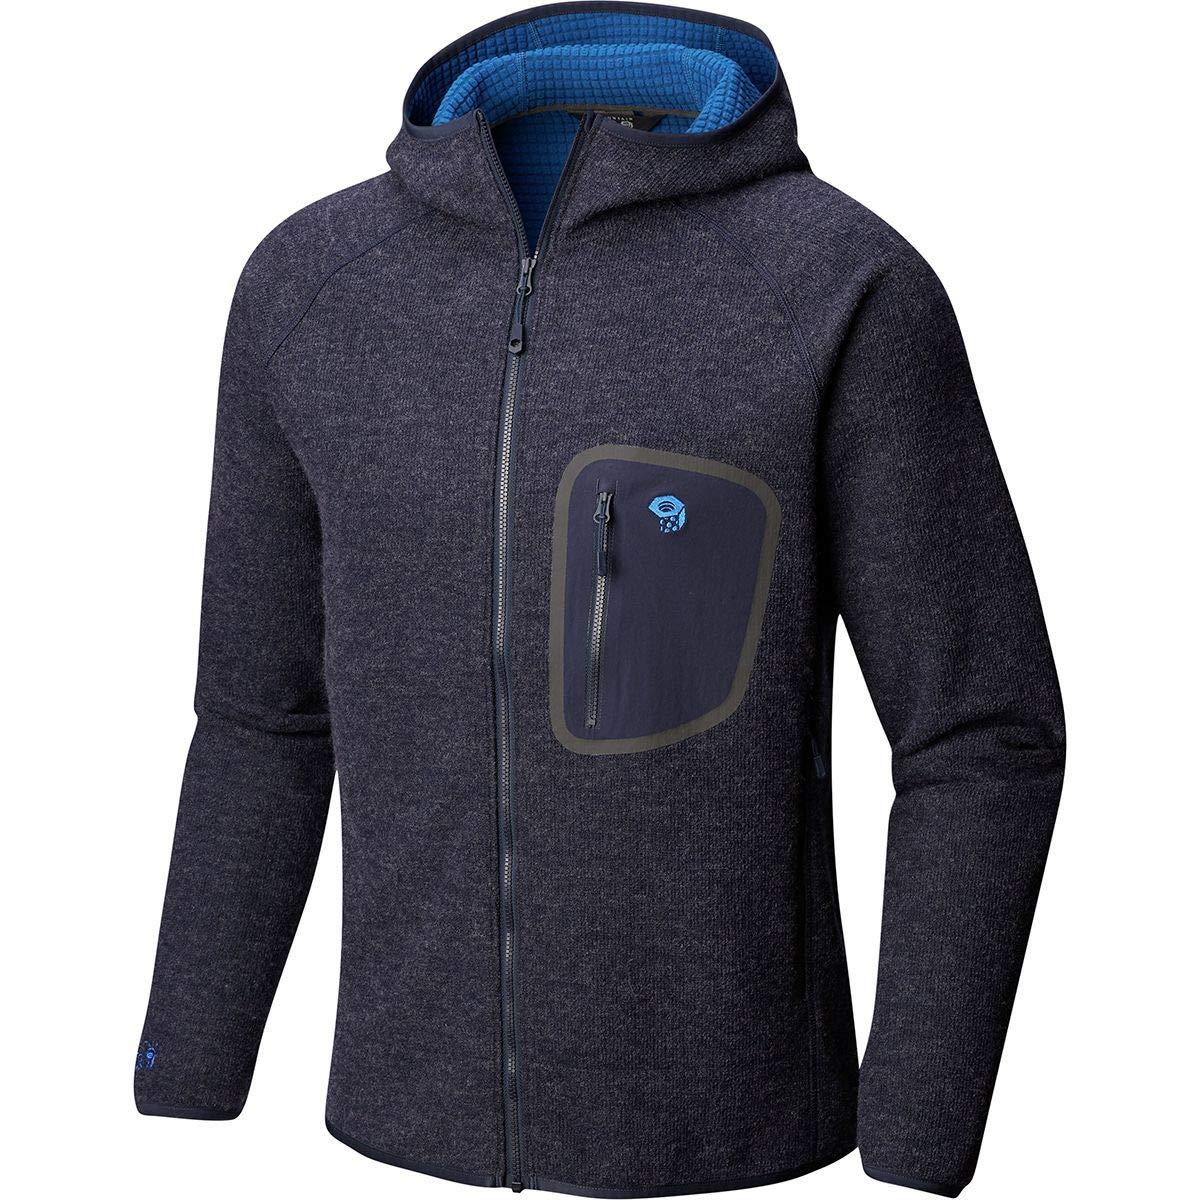 M Mountain Hardwear Hatcher Full-Zip Hooded Jacket Mens Dark Zinc